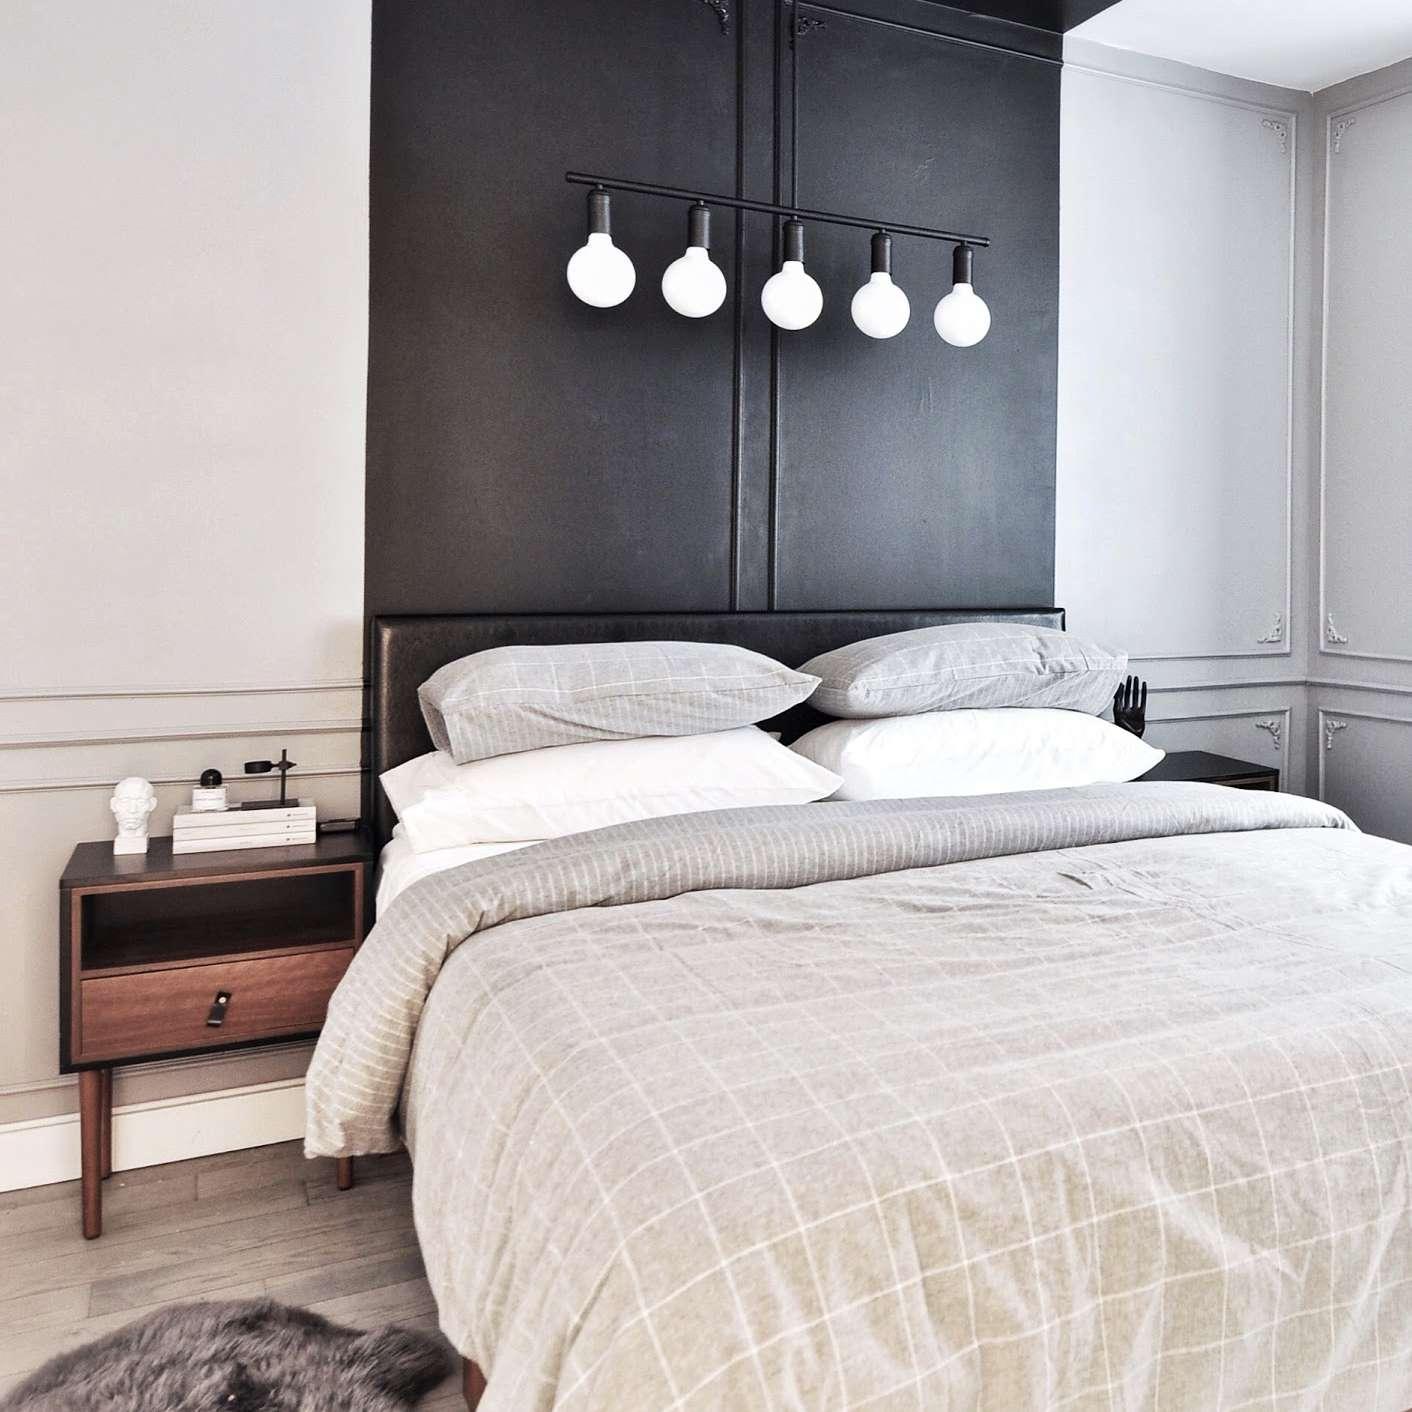 bedroom with black headboard - best bedroom ideas